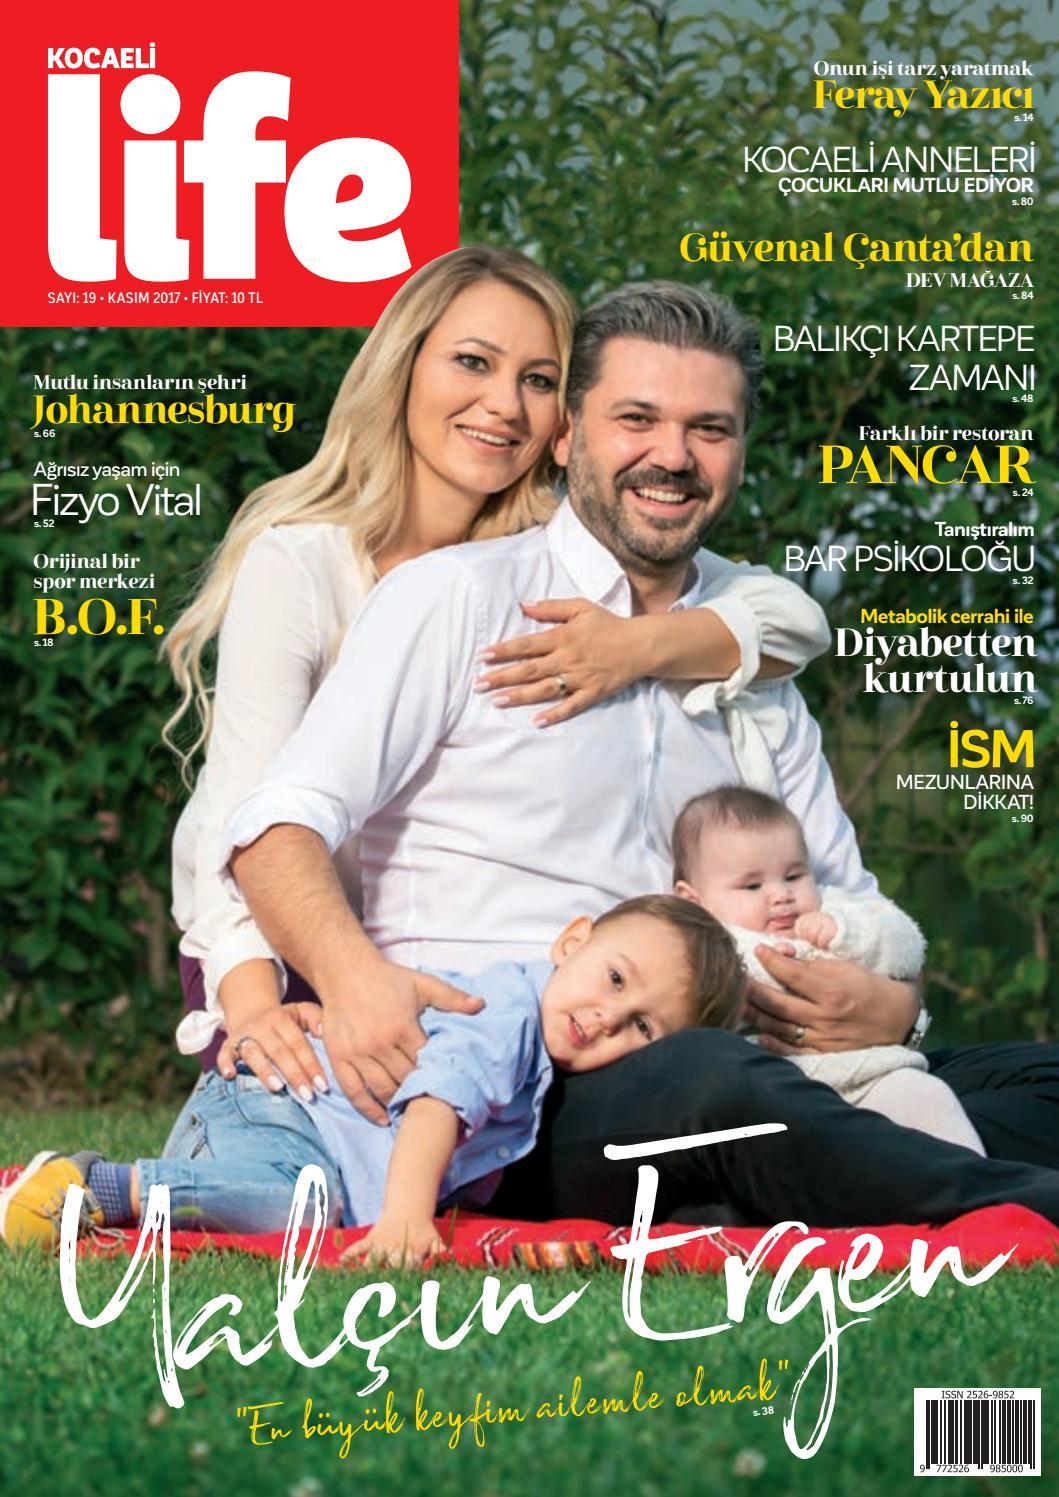 fb8ed29178f0e Kocaeli life kasim 2017 by Kocaeli Life - issuu